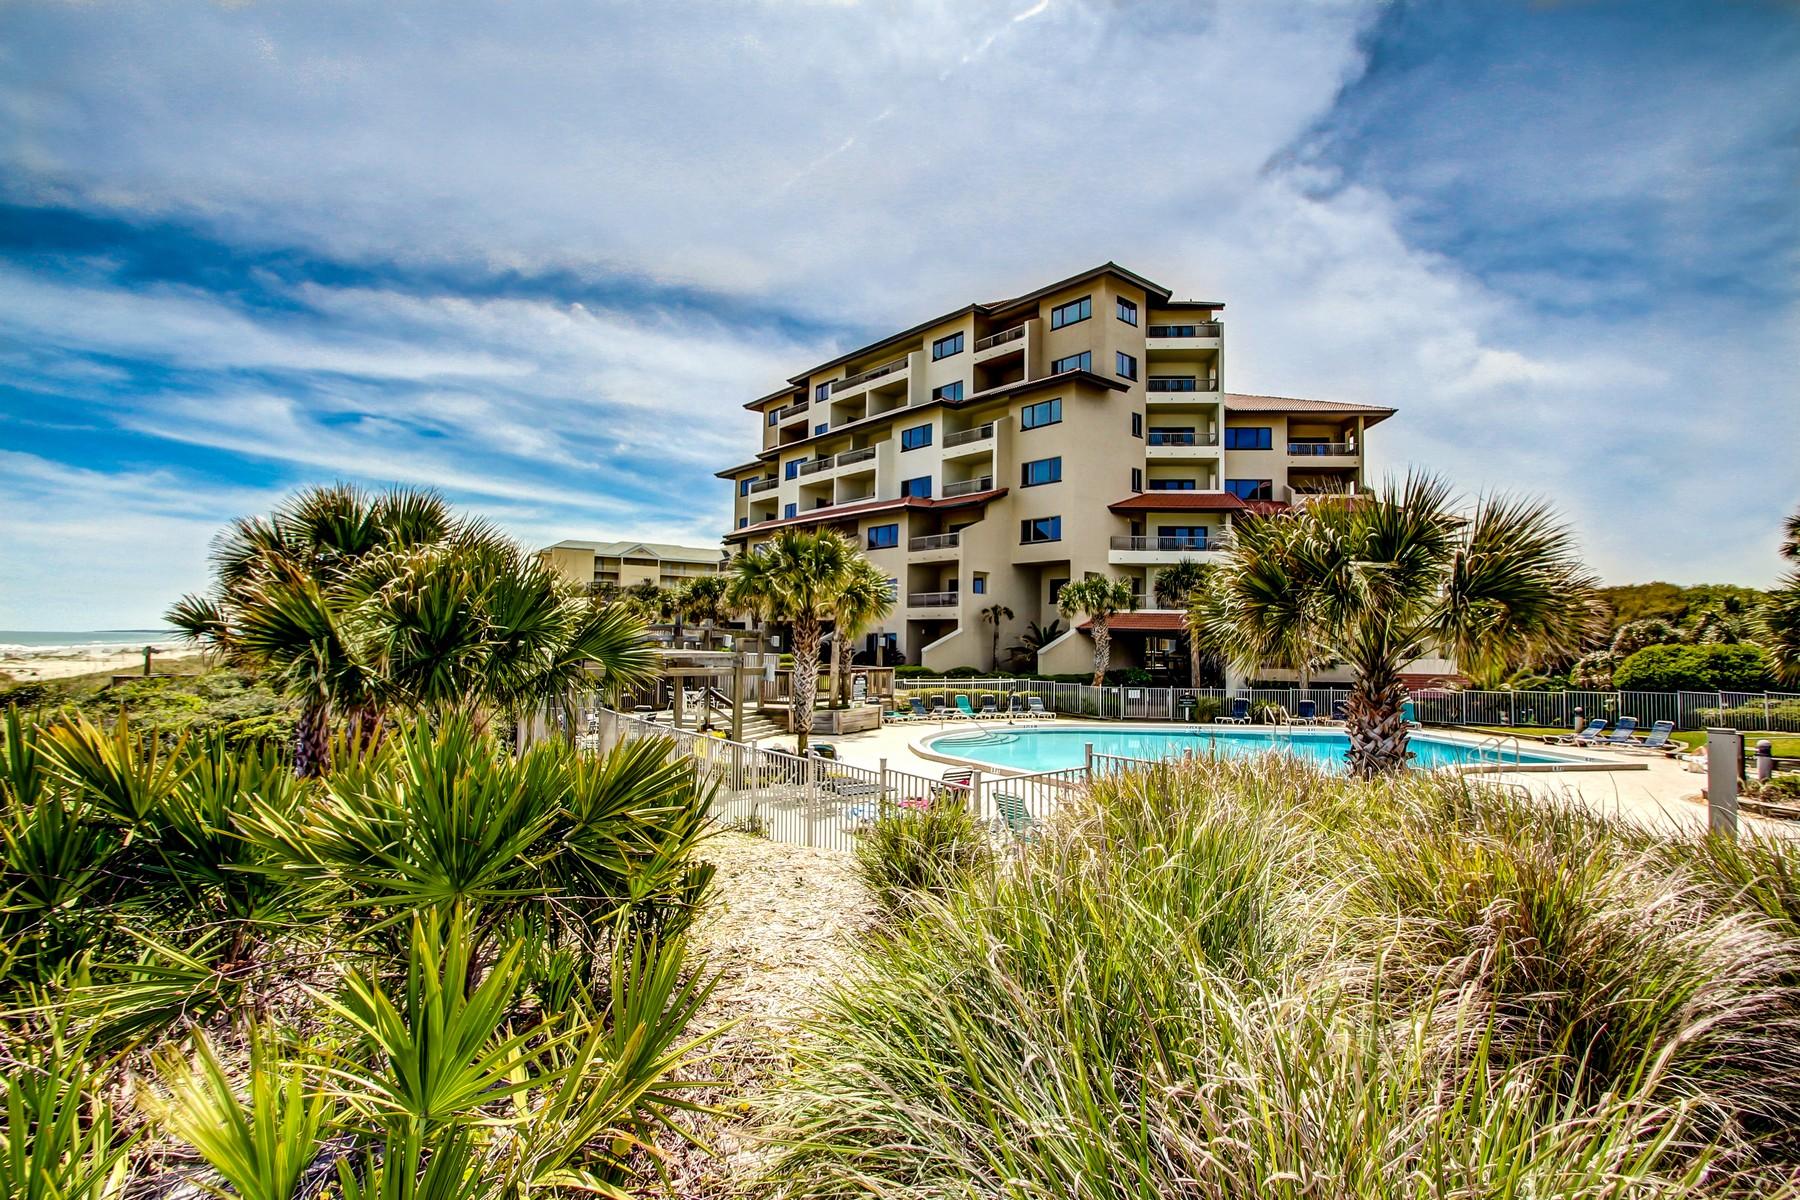 共管式独立产权公寓 为 销售 在 Oceanfront villa on the Amelia Island Plantation 200 Sandcastles Court, 阿梅利亚, 佛罗里达州, 32034 美国